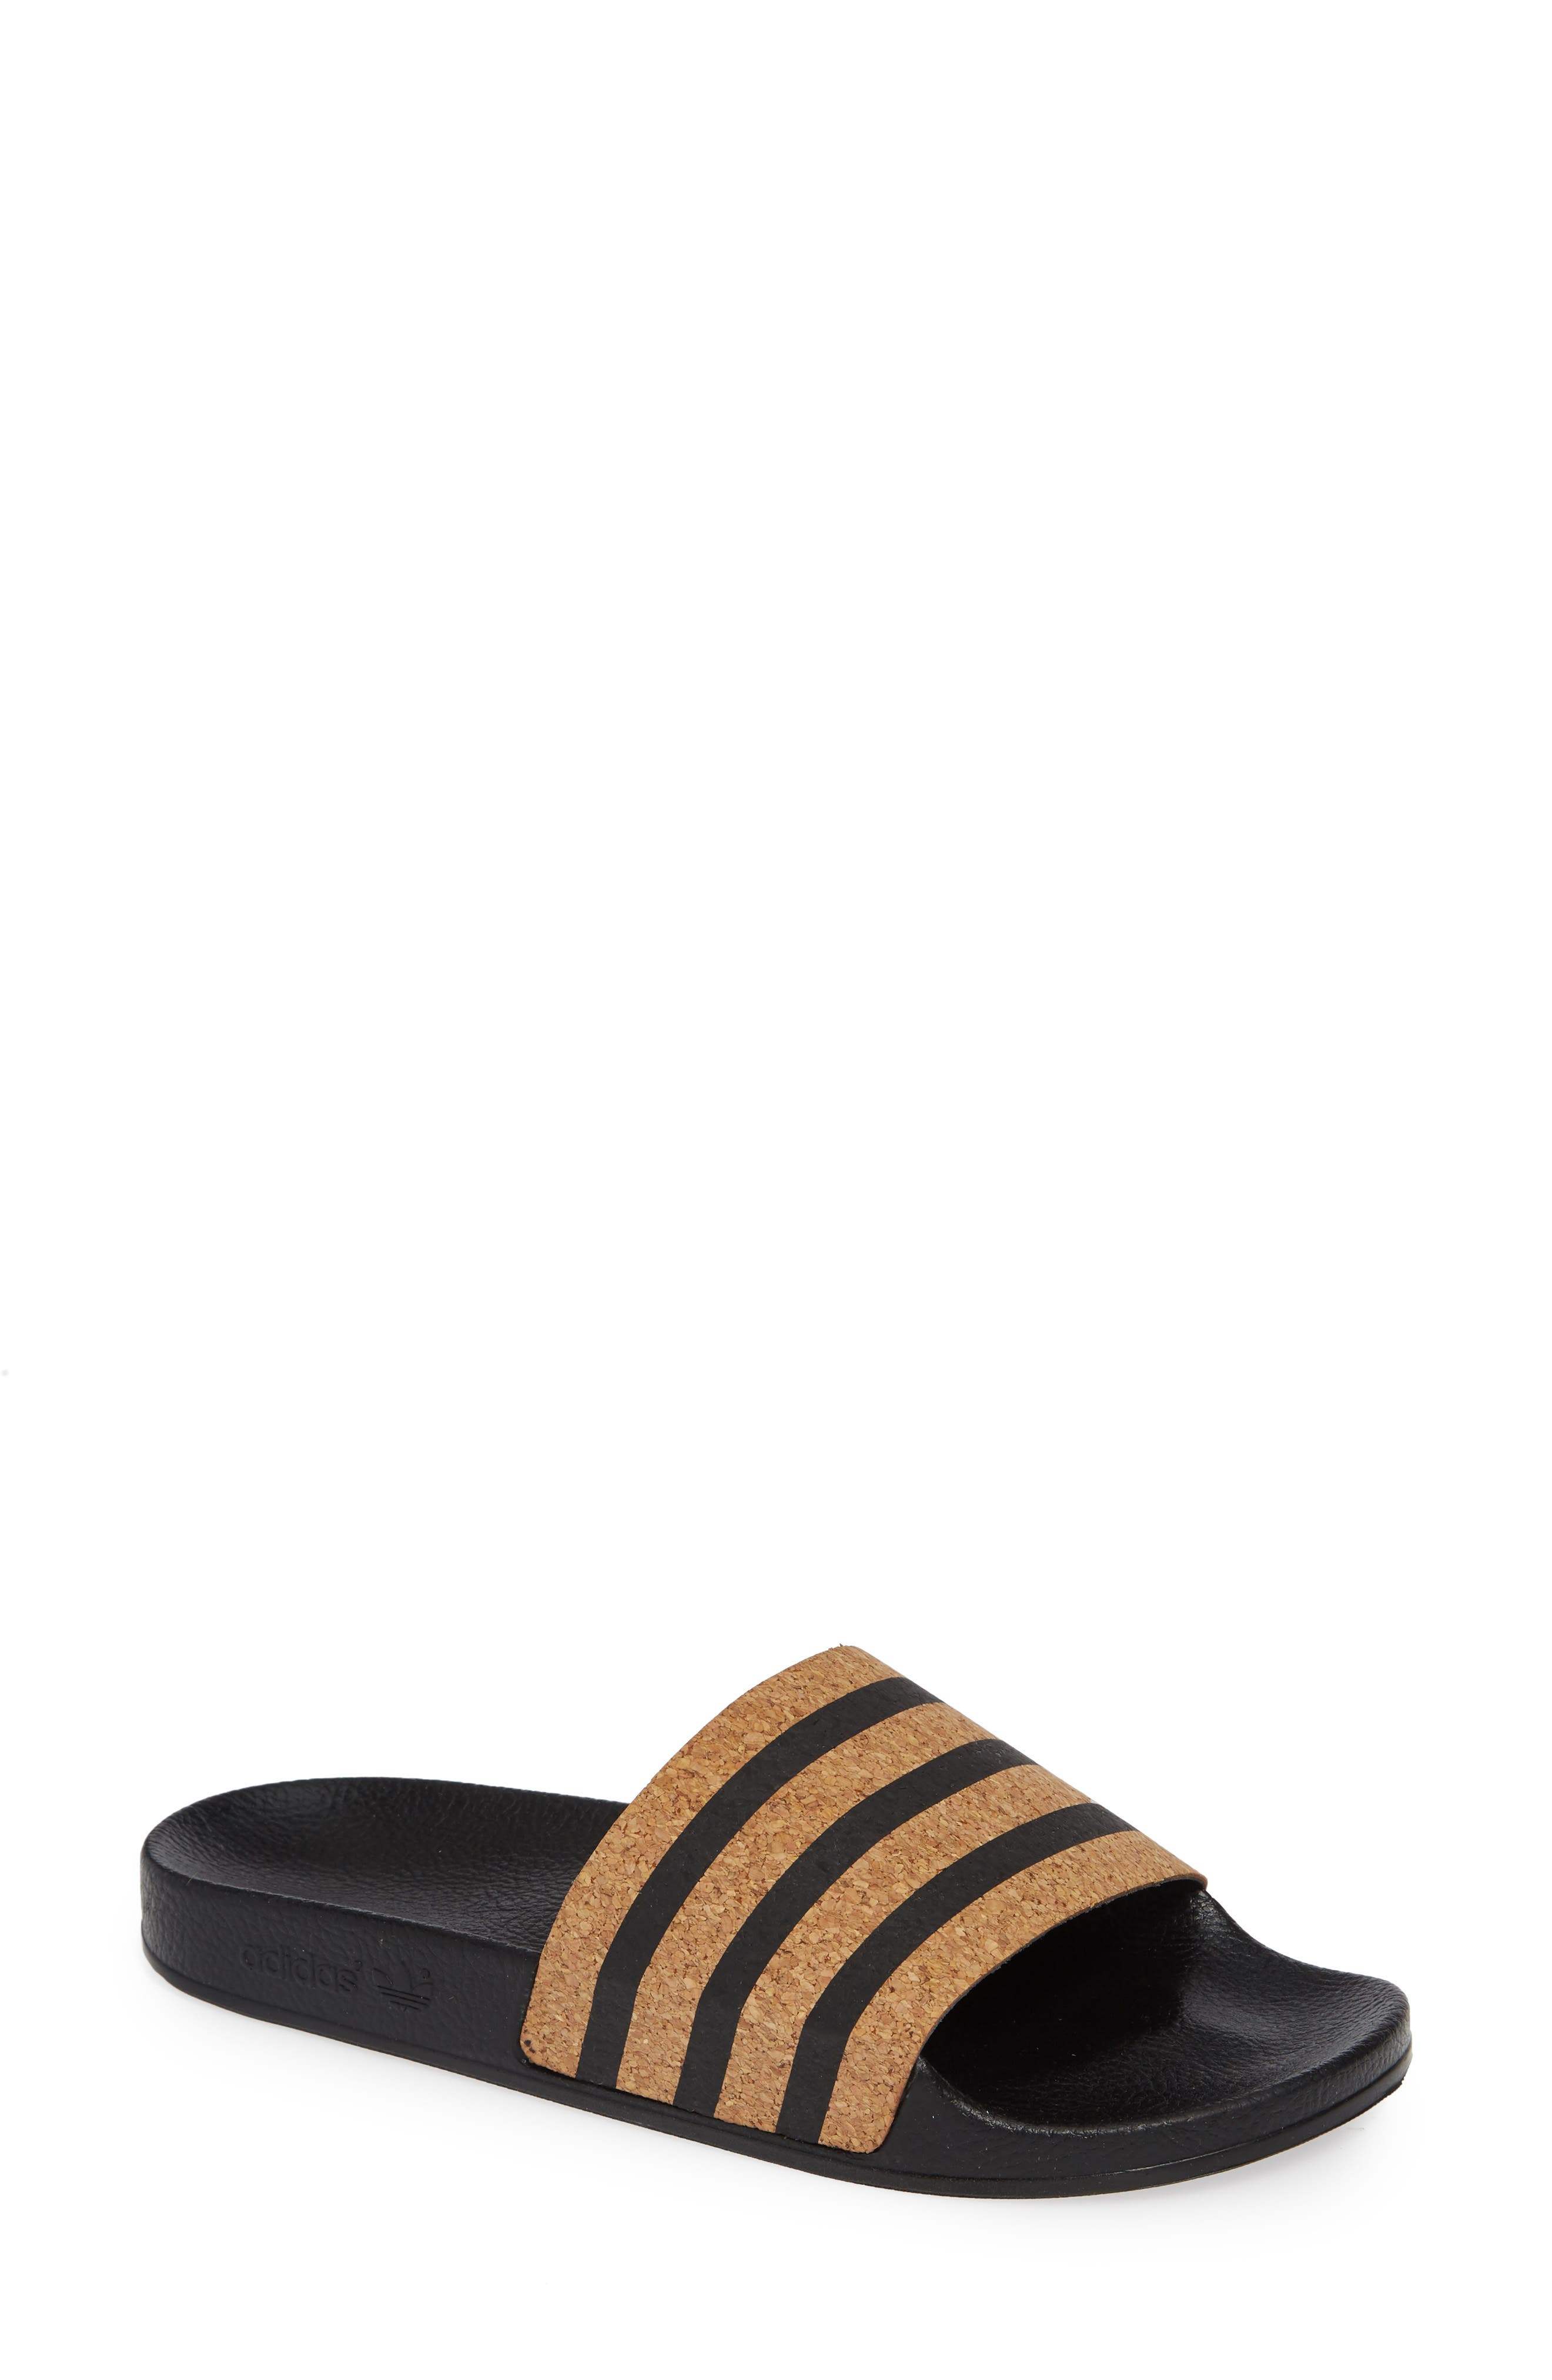 'Adilette' Slide Sandal,                         Main,                         color, CORE BLACK/ CORE BLACK